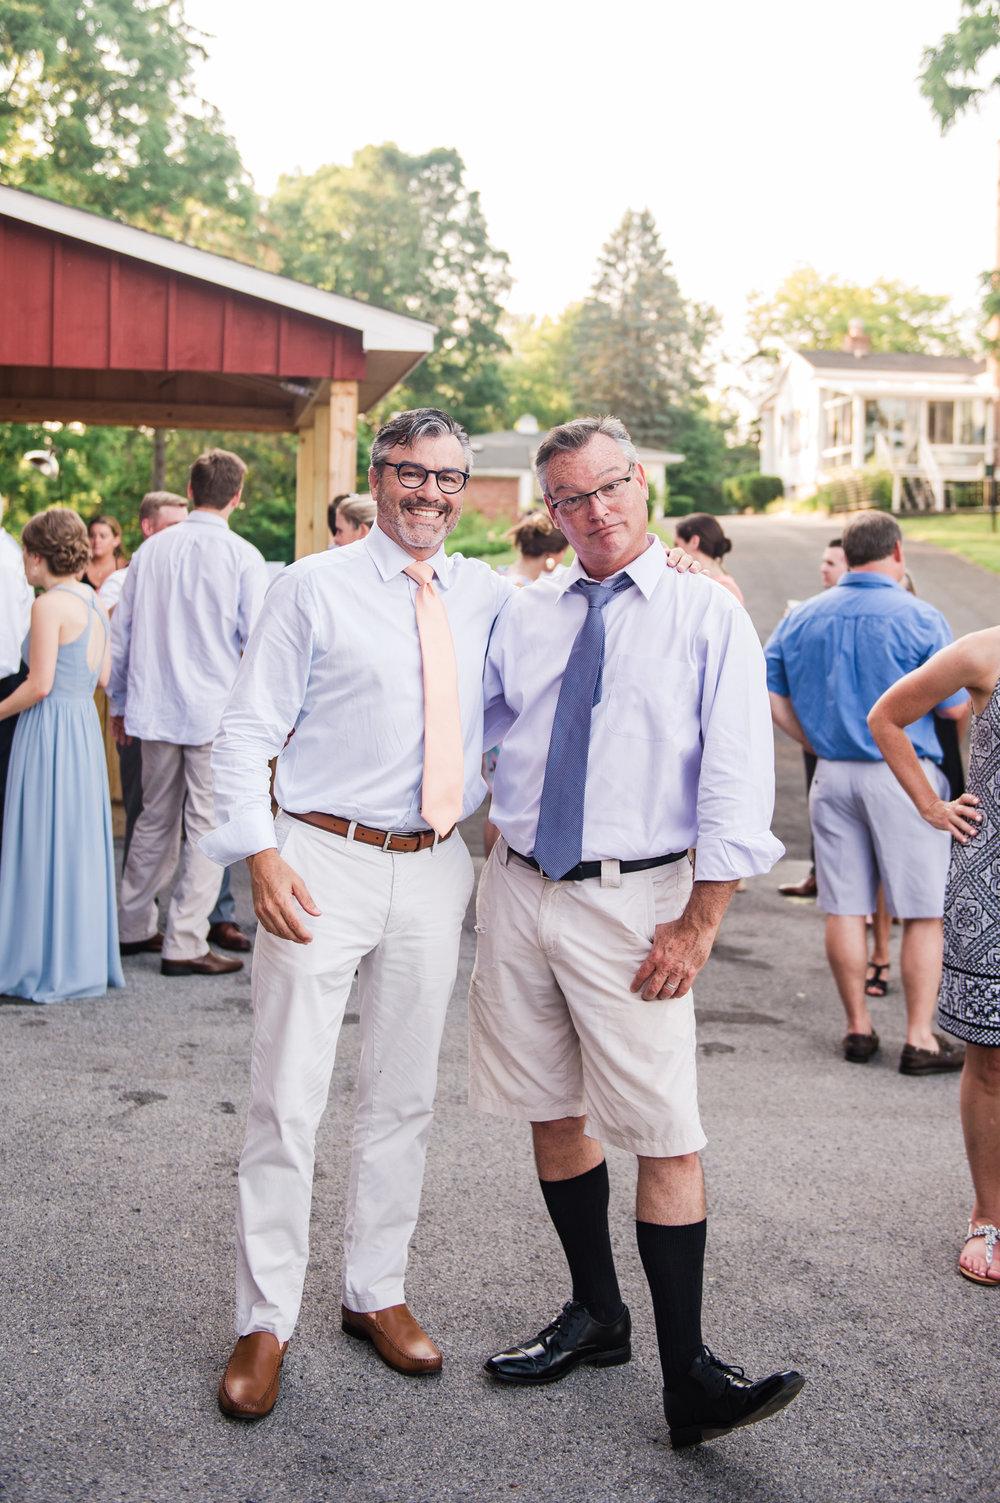 JILLSTUDIO_Toganenwood_Estate_Rochester_Wedding_Rochester_NY_Photographer_DSC_6553.jpg